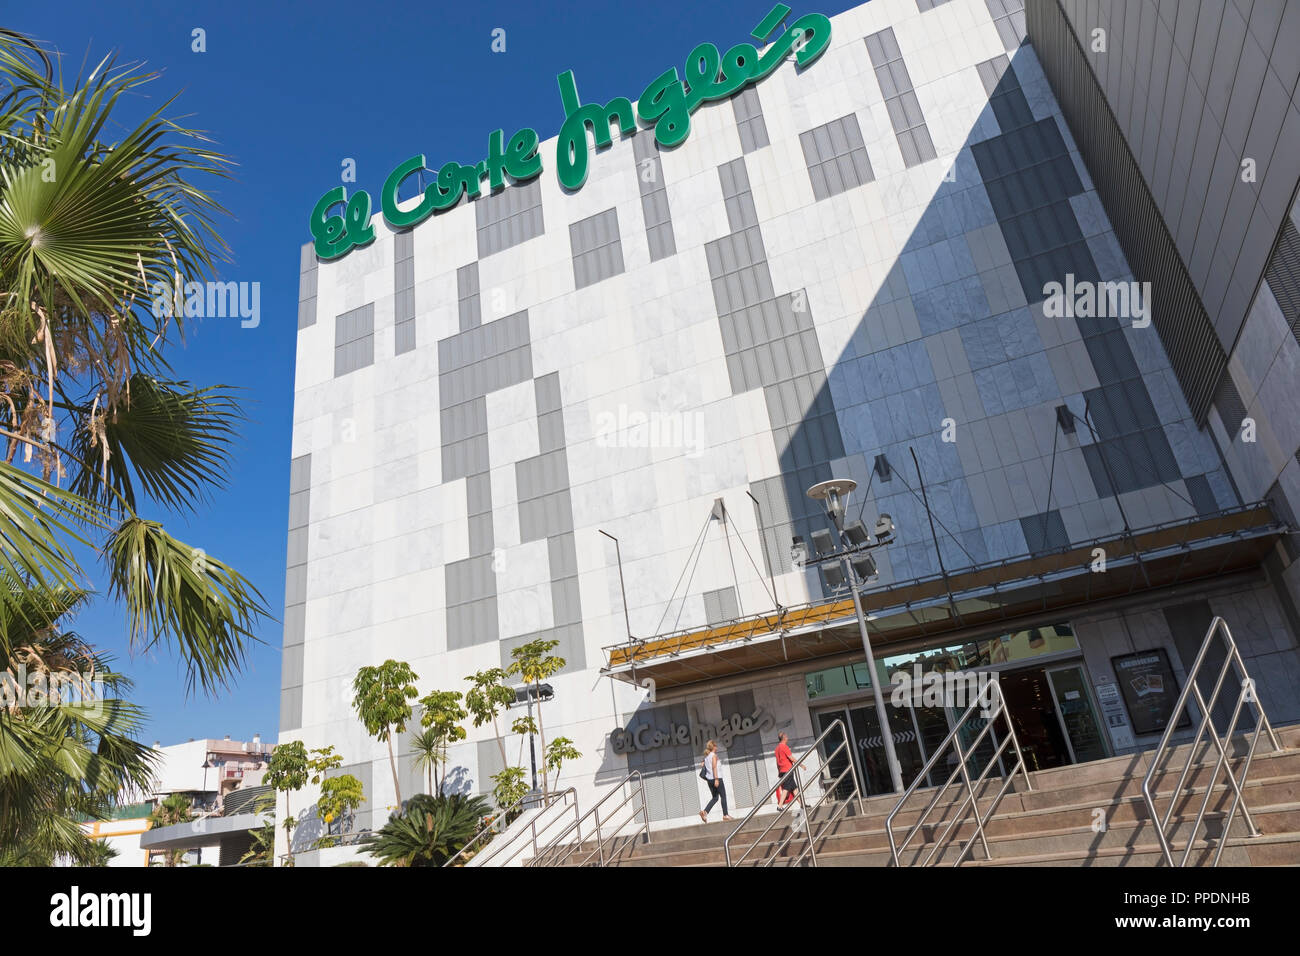 Fuengirola, Costa del Sol, Provinz Malaga, Andalusien, Südspanien. Menschen, El Corte Ingles. Stockbild